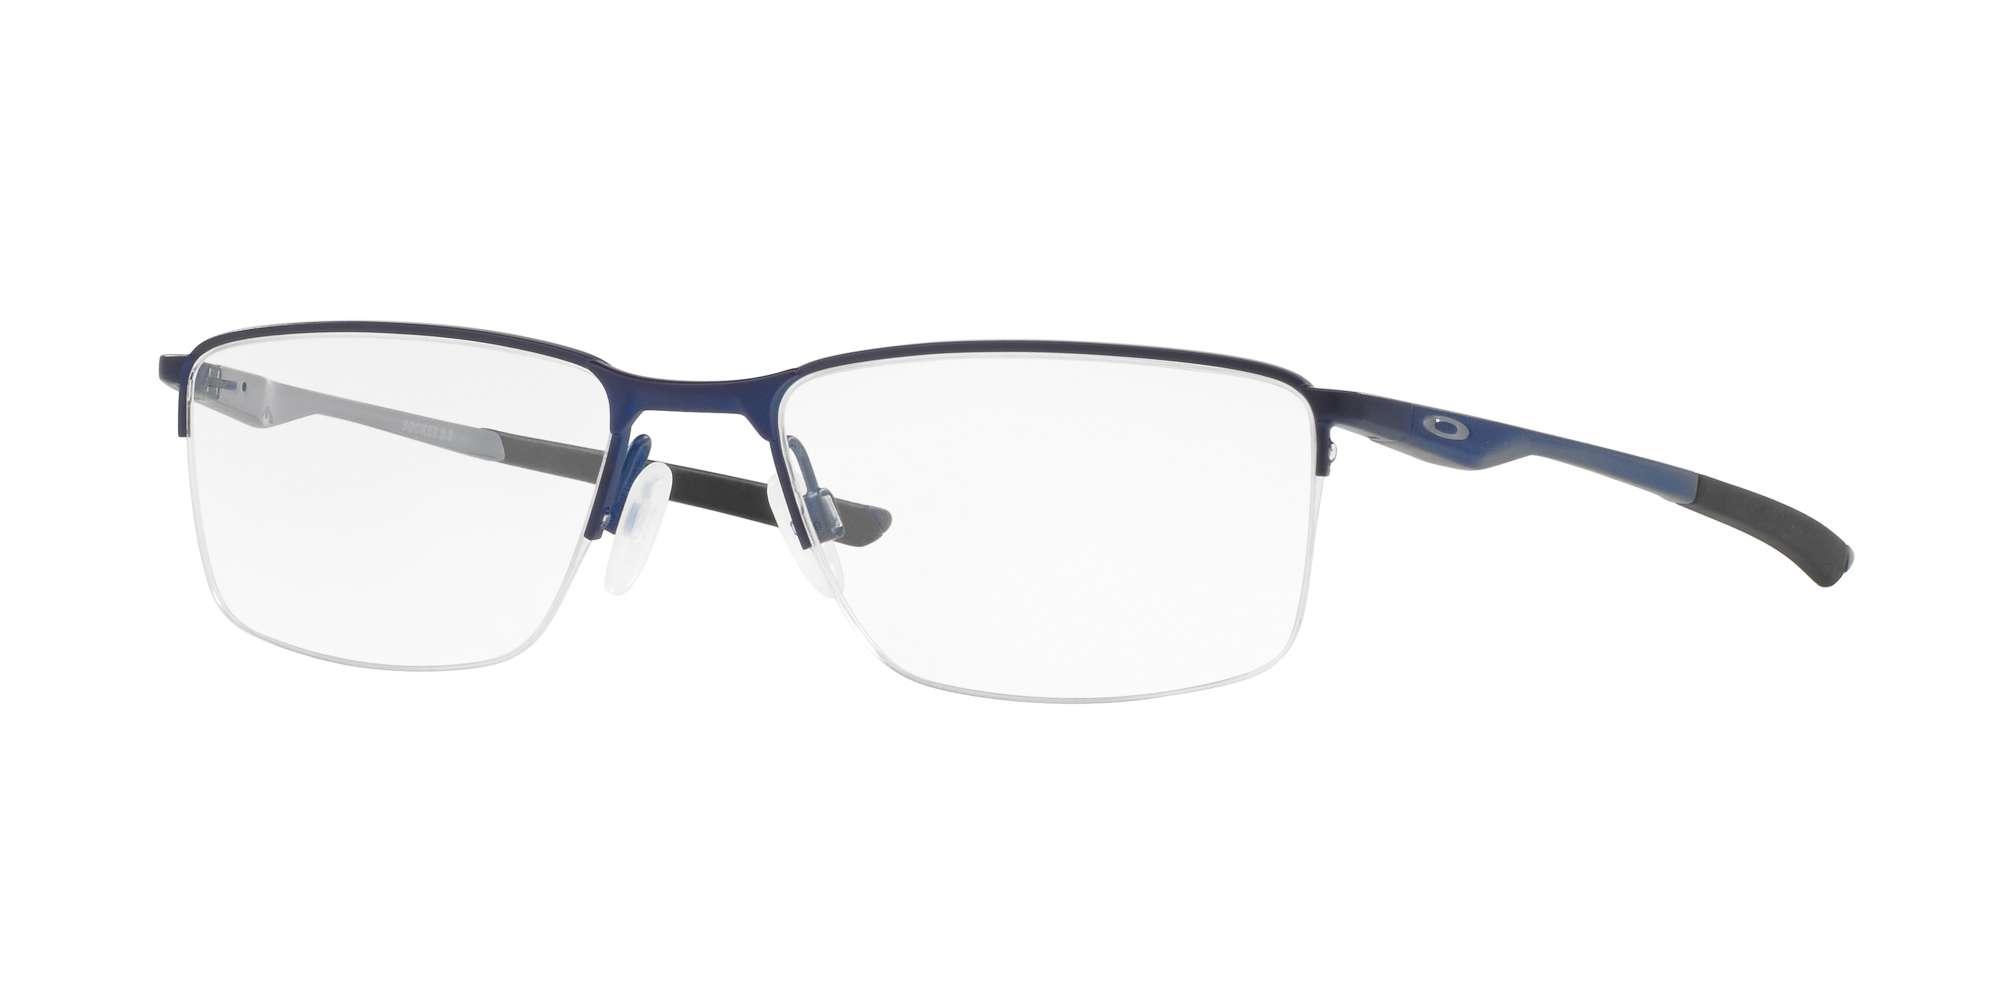 MATTE MIDNIGHT / CLEAR lenses